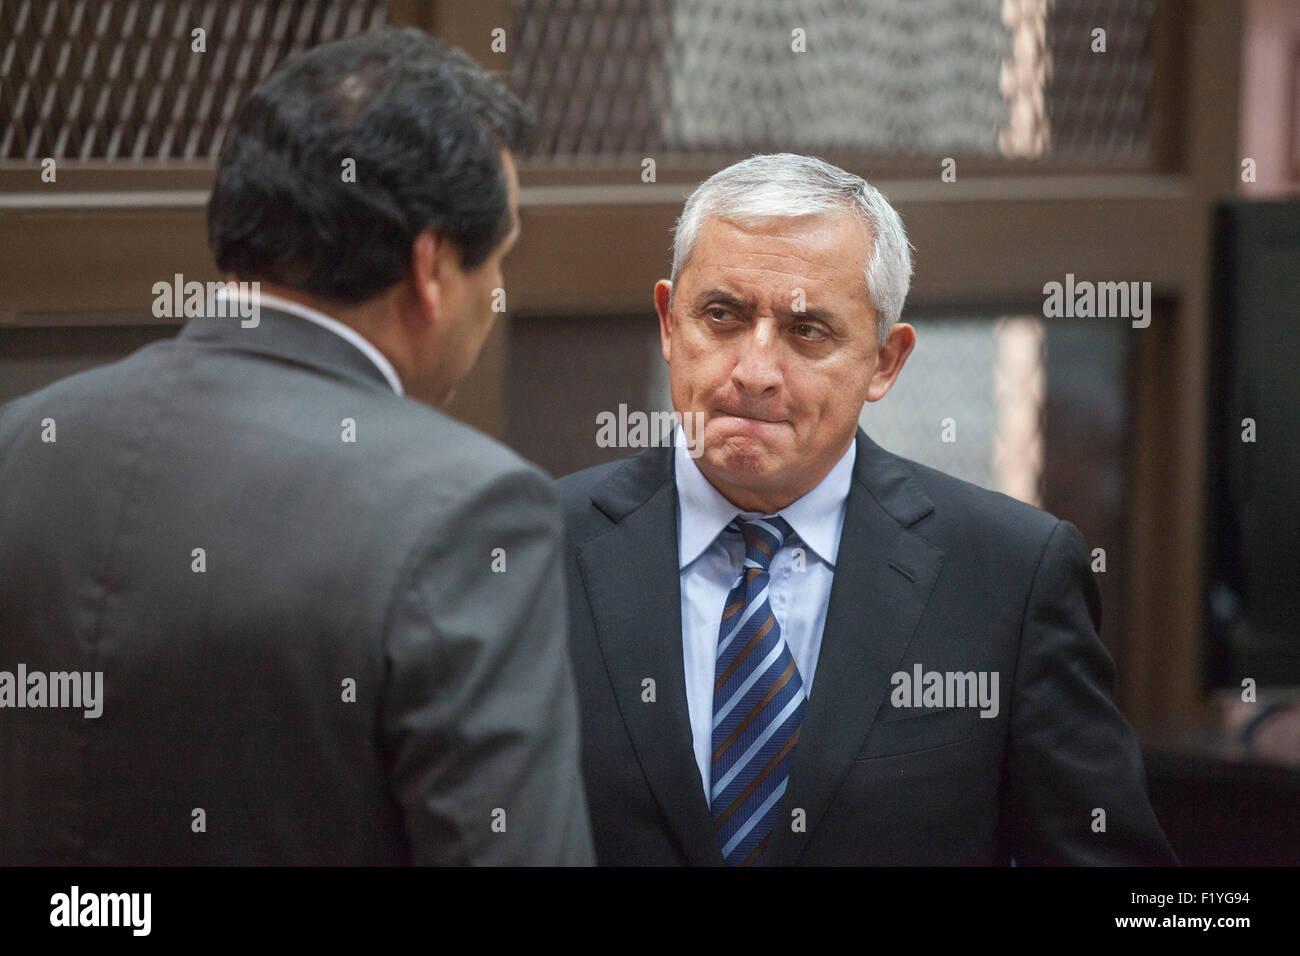 Guatemala City, Guatemala. 8th Sep, 2015. Former Guatemalan president Otto Perez Molina(R) reacts during a hearing - Stock Image